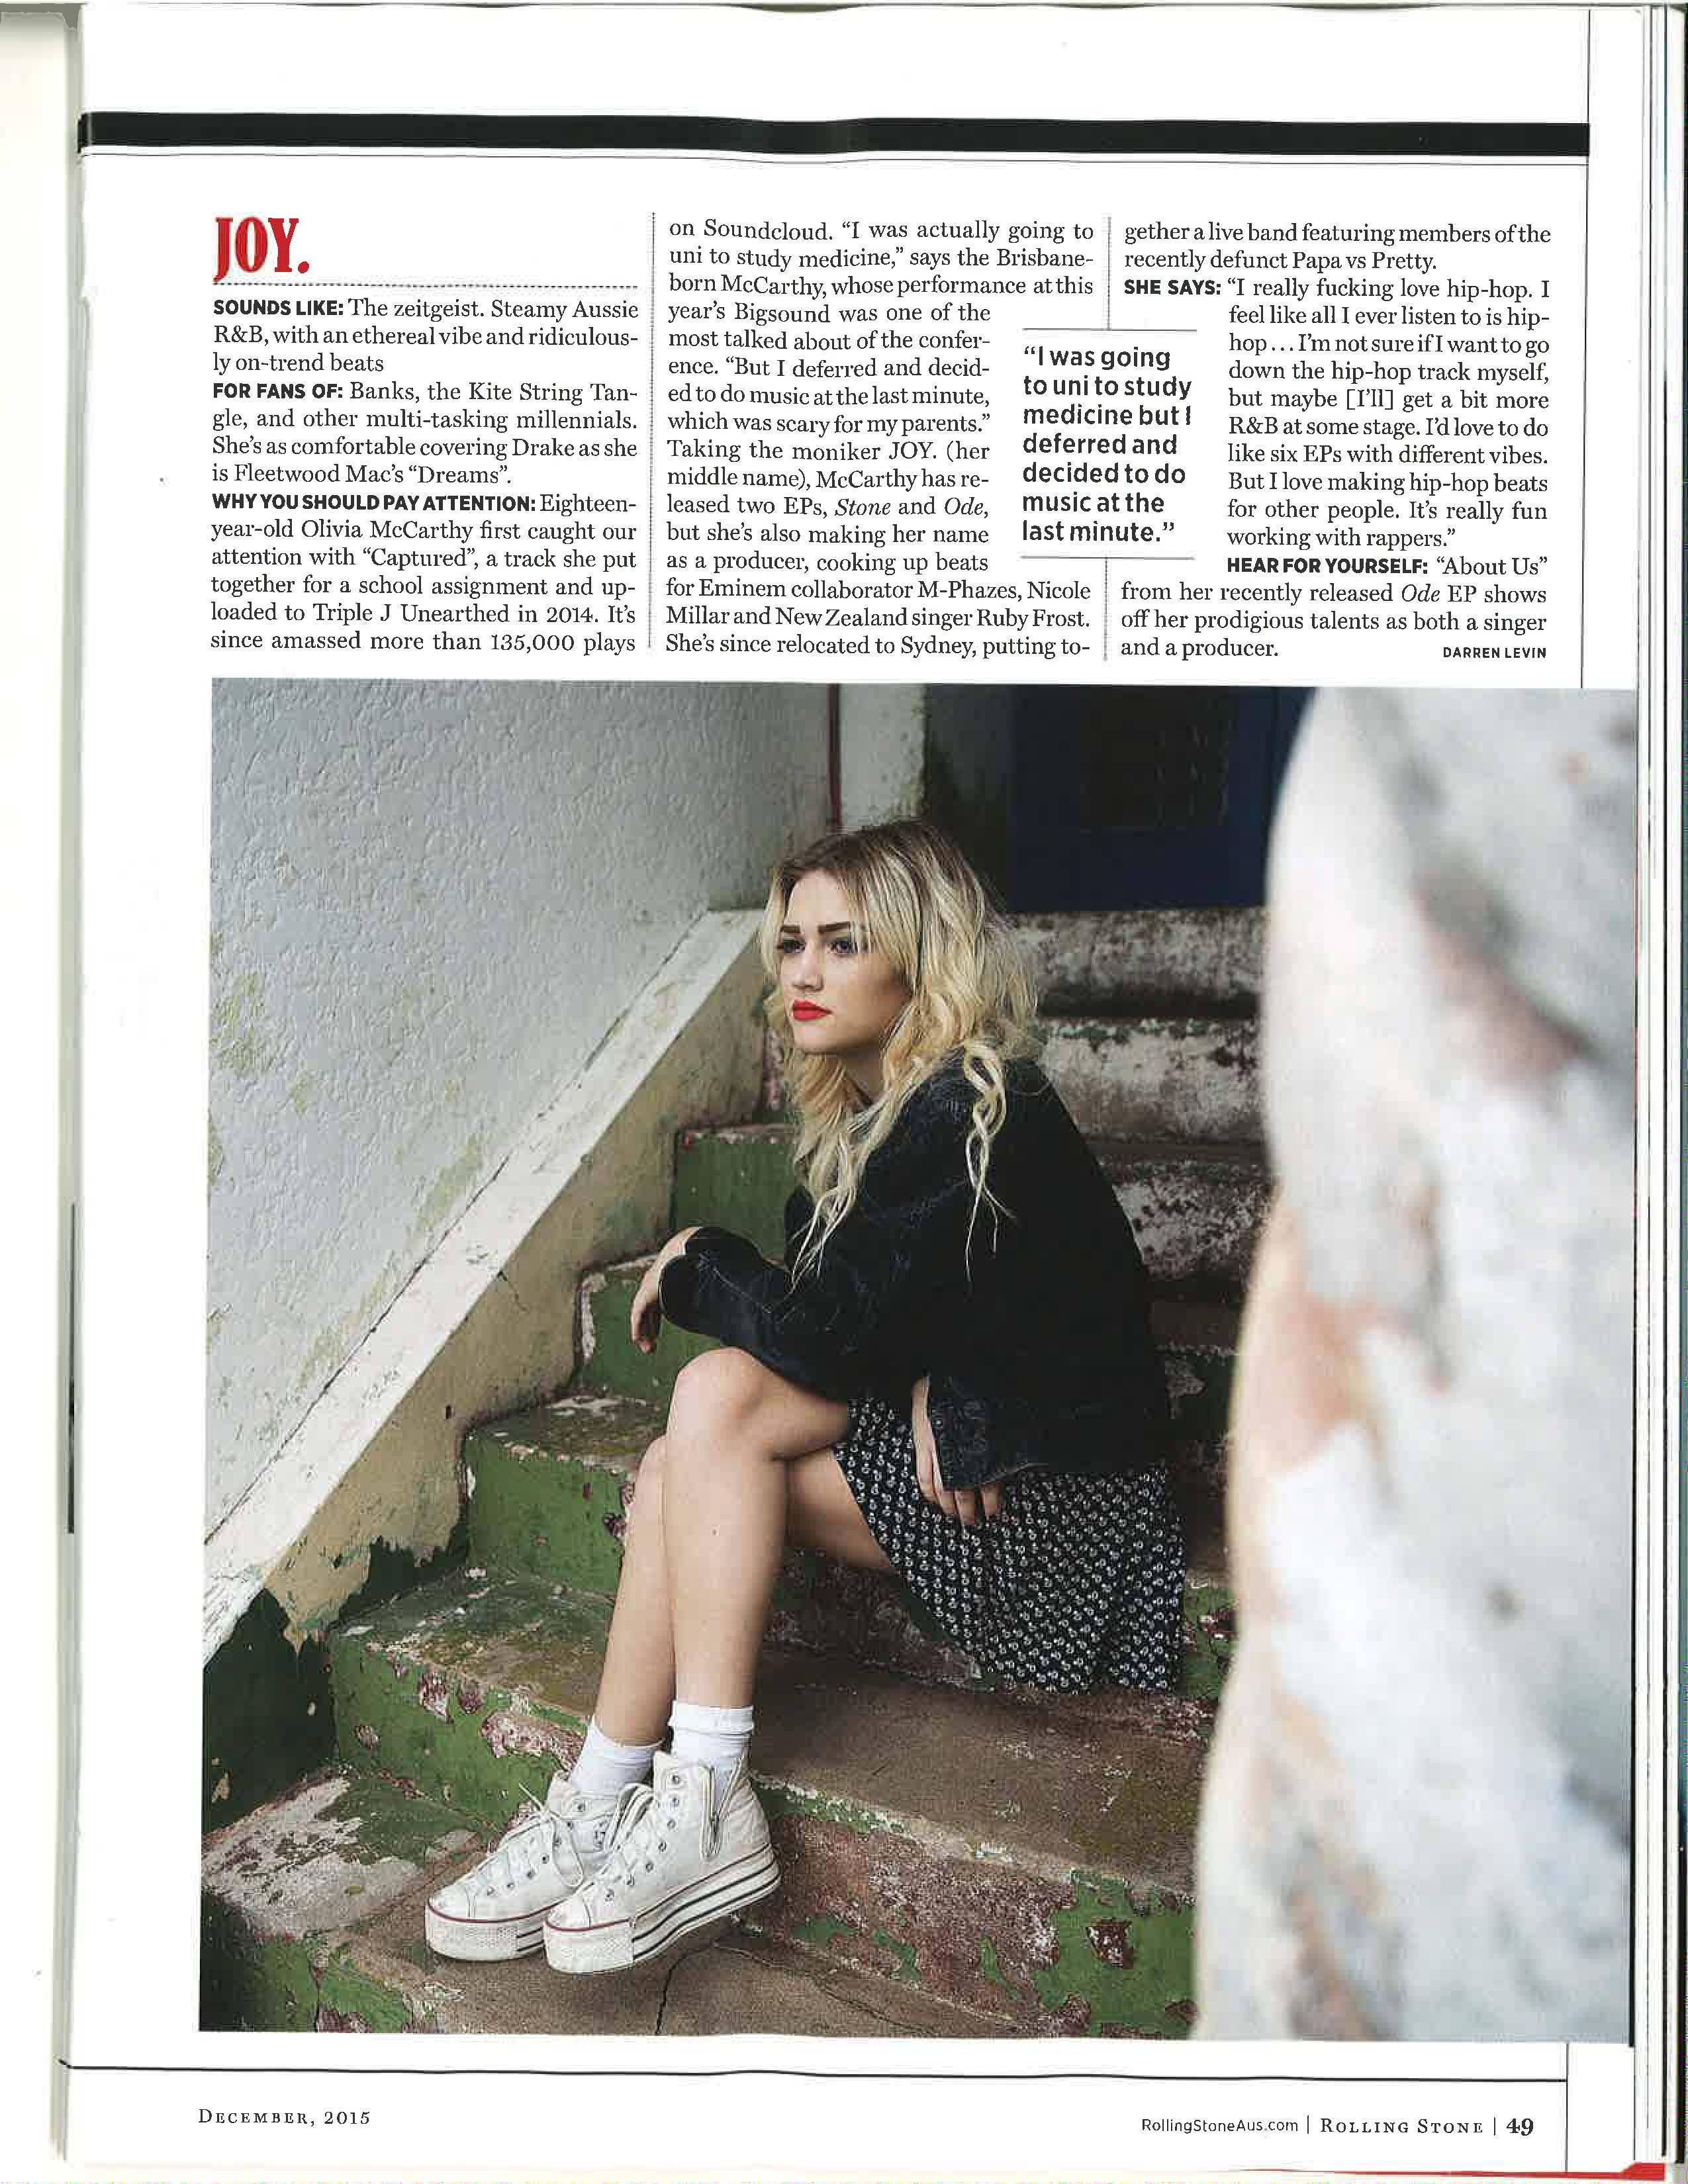 JOY Rolling Stone Dec 2015